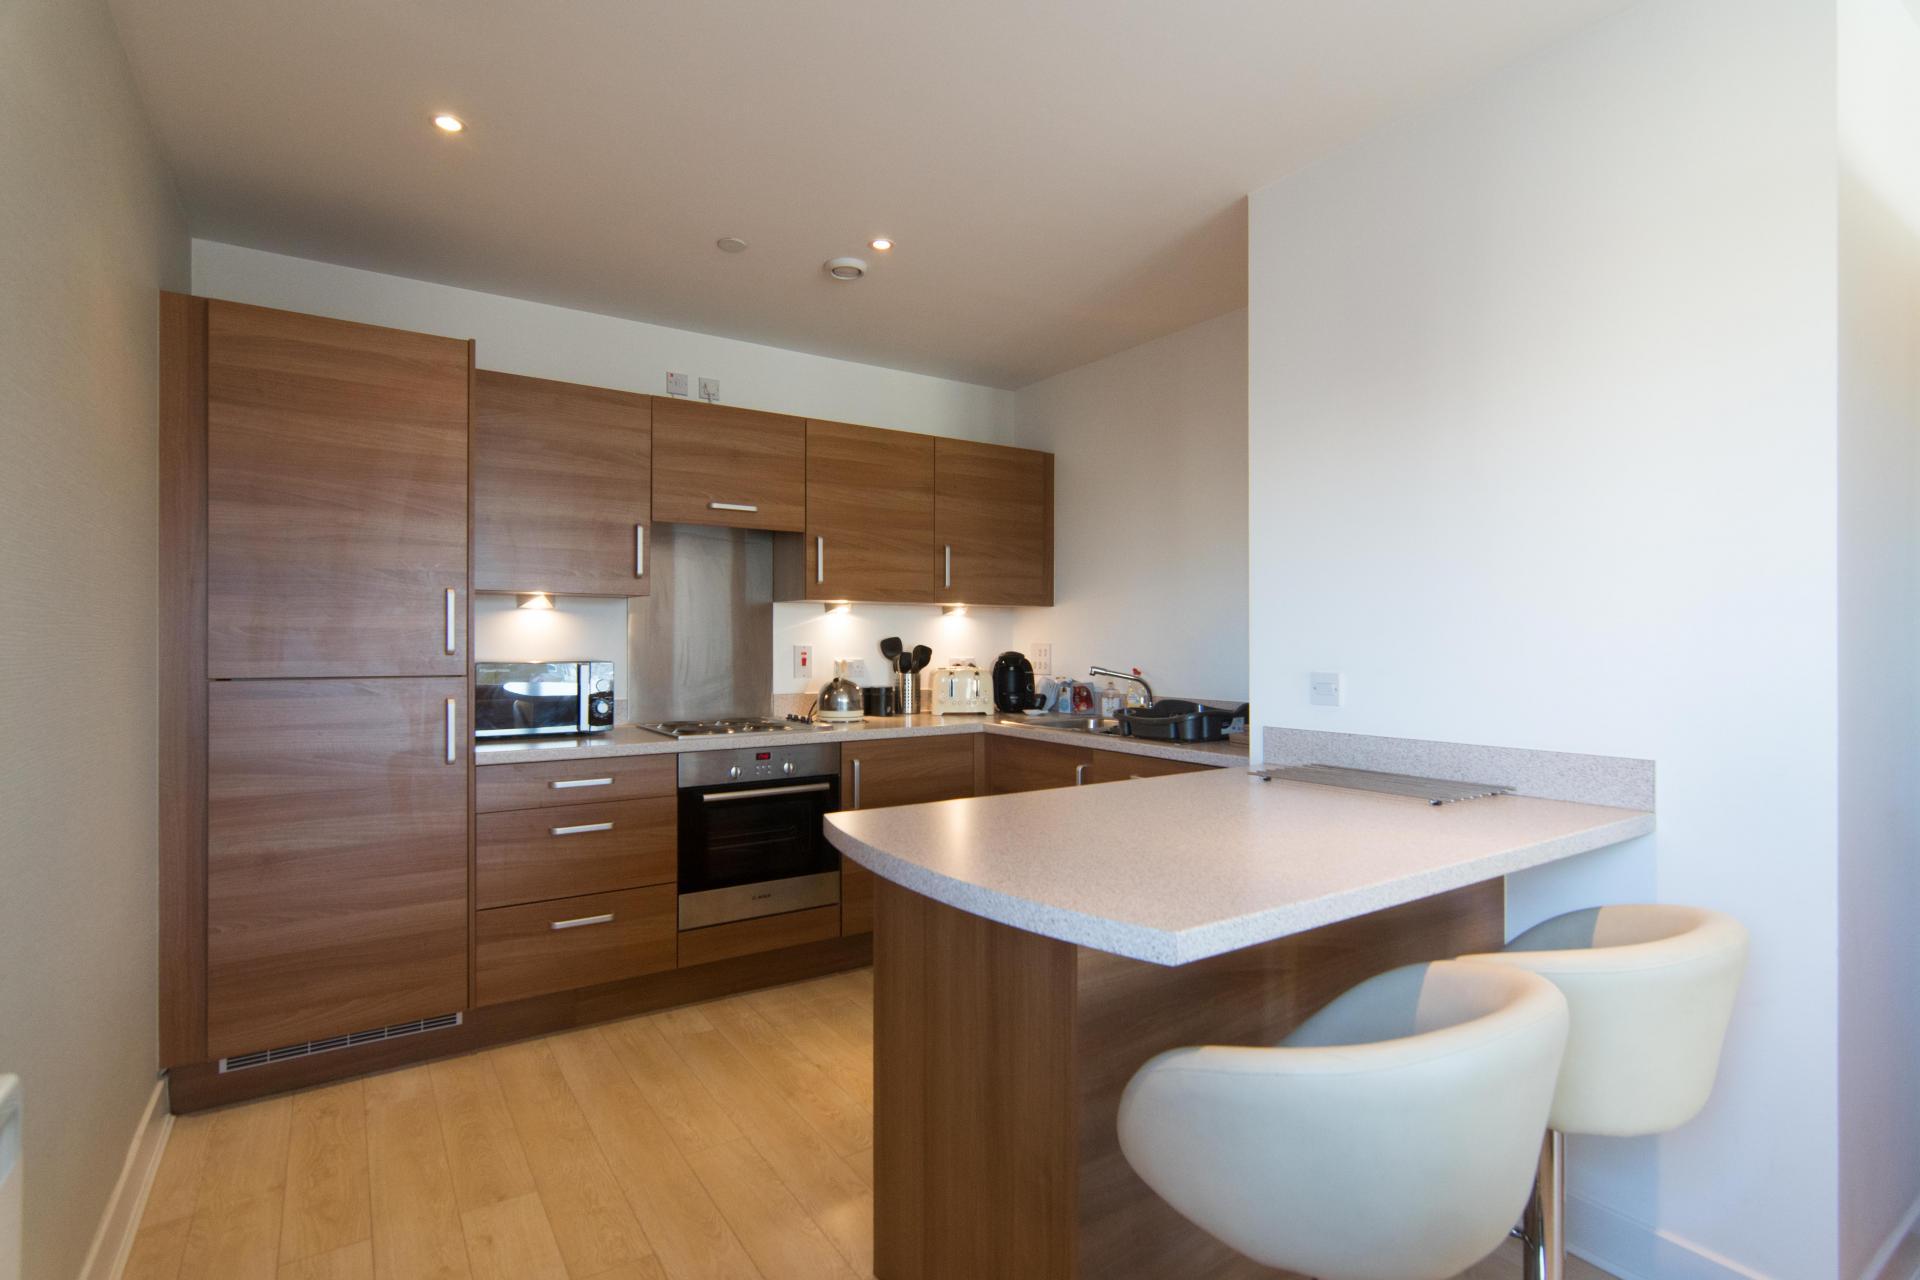 Kitchen at Glasgow Skyline Apartments, Centre, Glasgow - Citybase Apartments